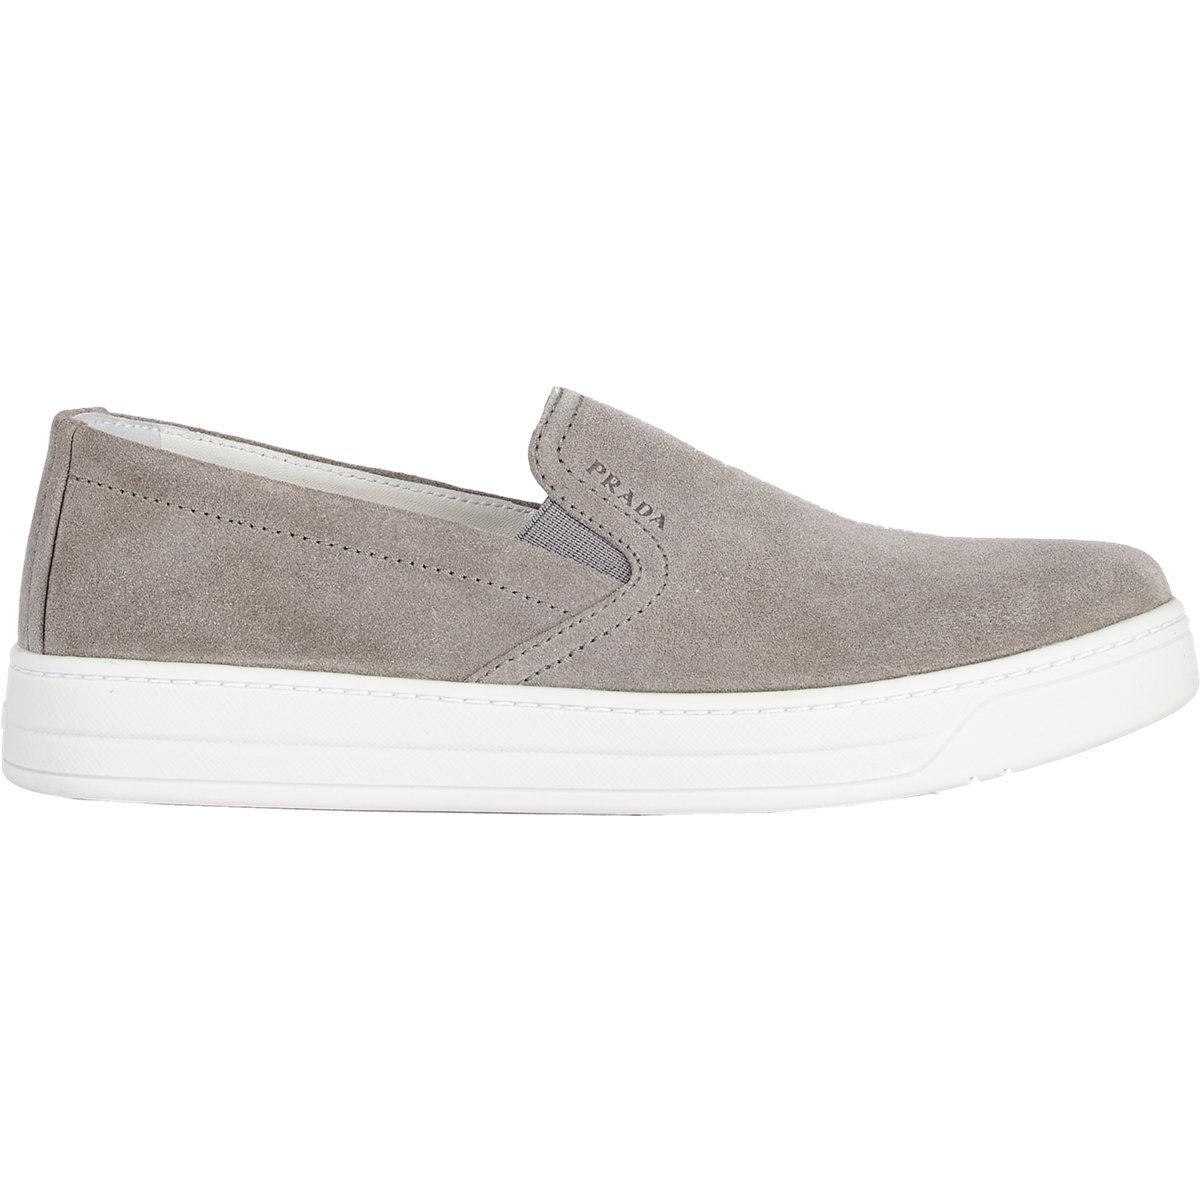 Prada Slip-on Sneakers in Gray - Lyst 3c37708a14